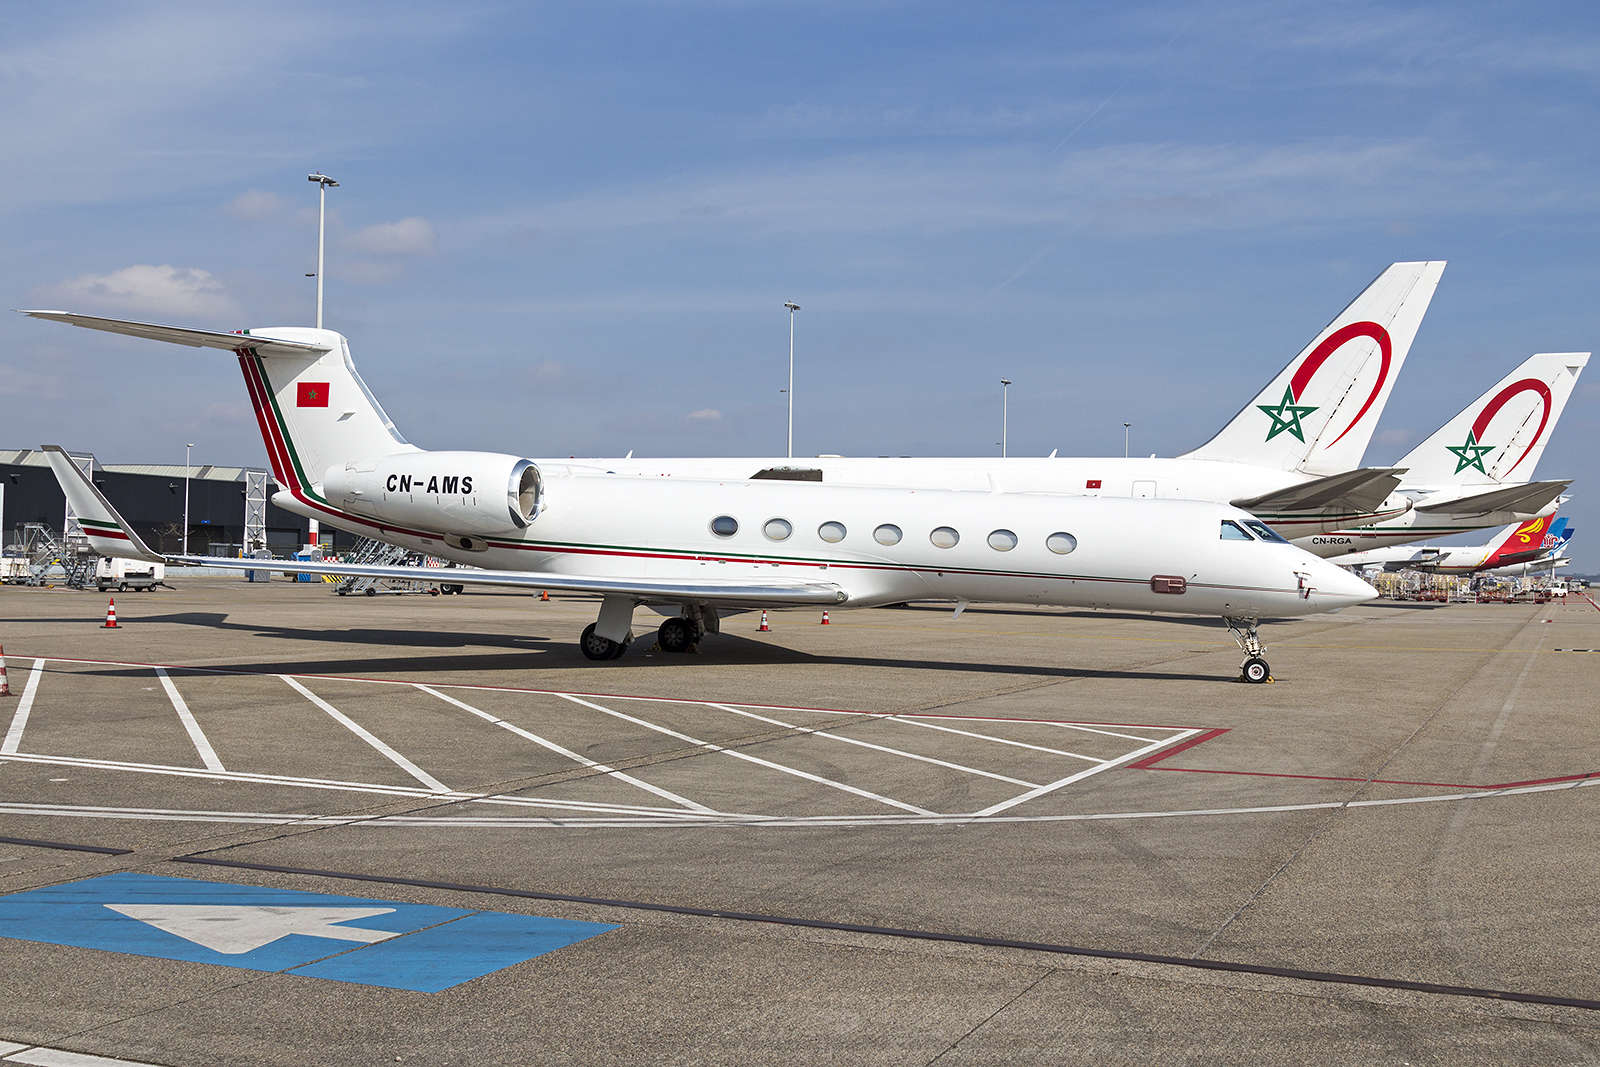 FRA: Avions VIP, Liaison & ECM - Page 12 25447606393_1fbd8b9187_o